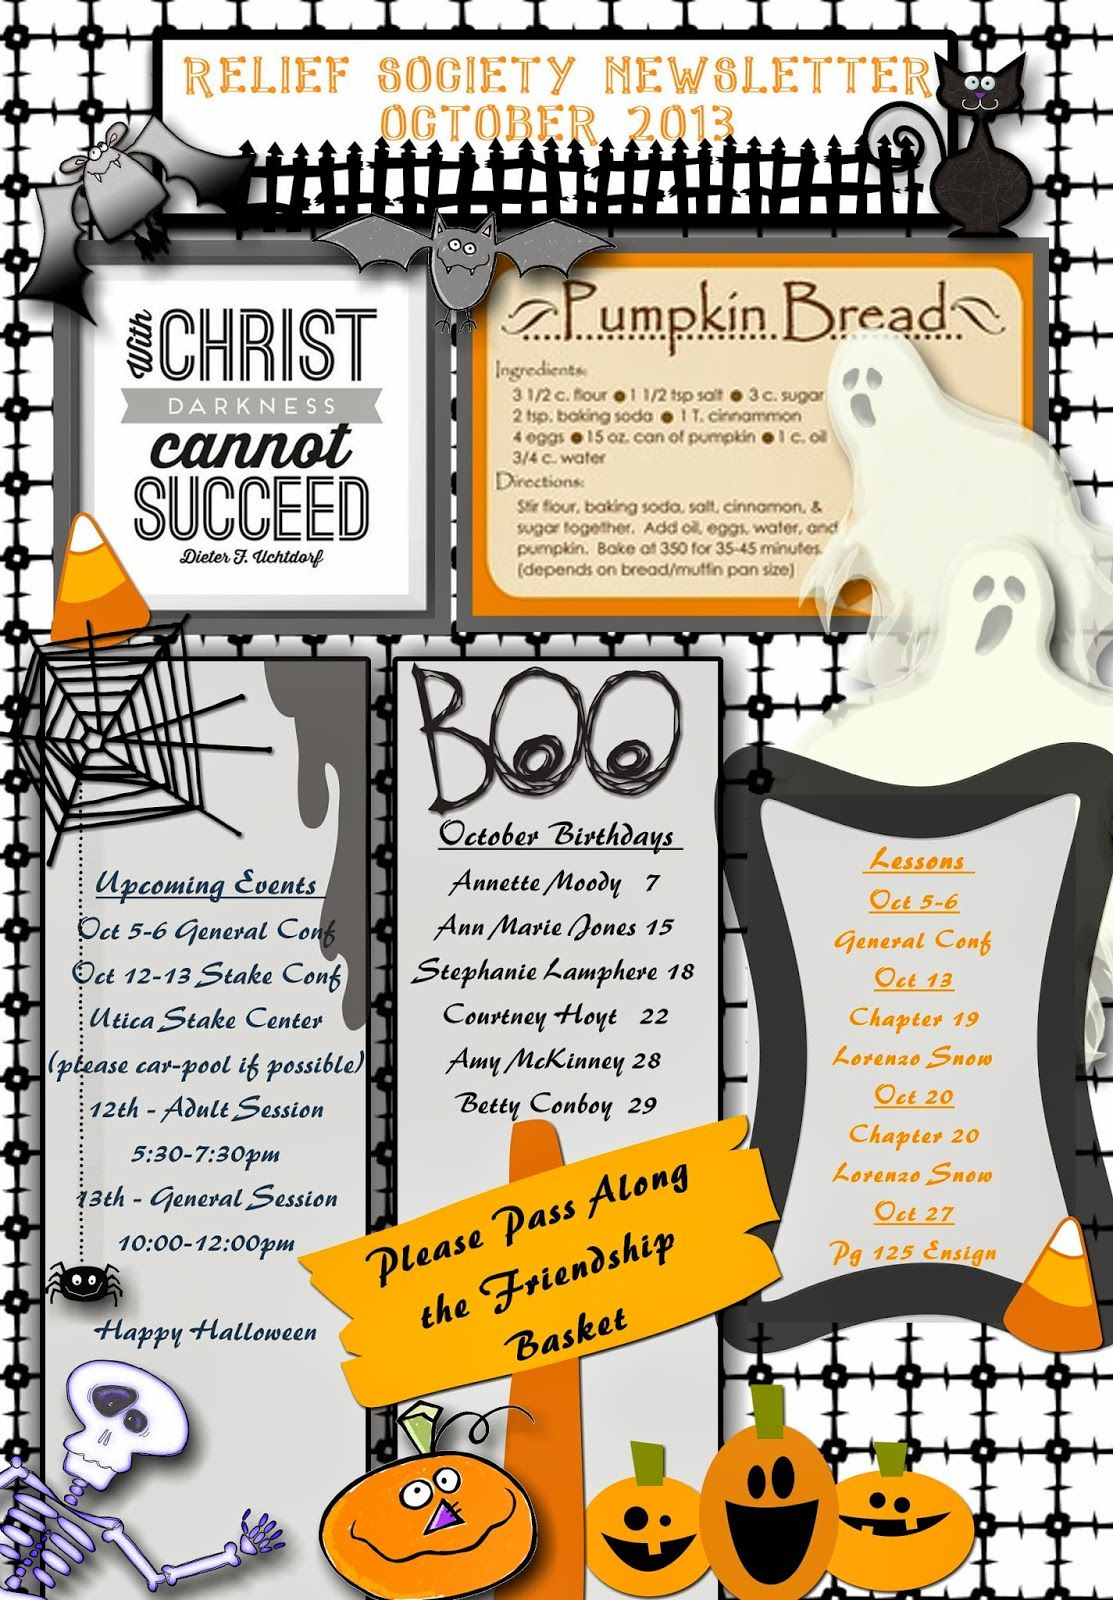 90b6297e76259a489e61c6c9bca81ad2 Teacher Pay Free Newsletter Template For Halloween on